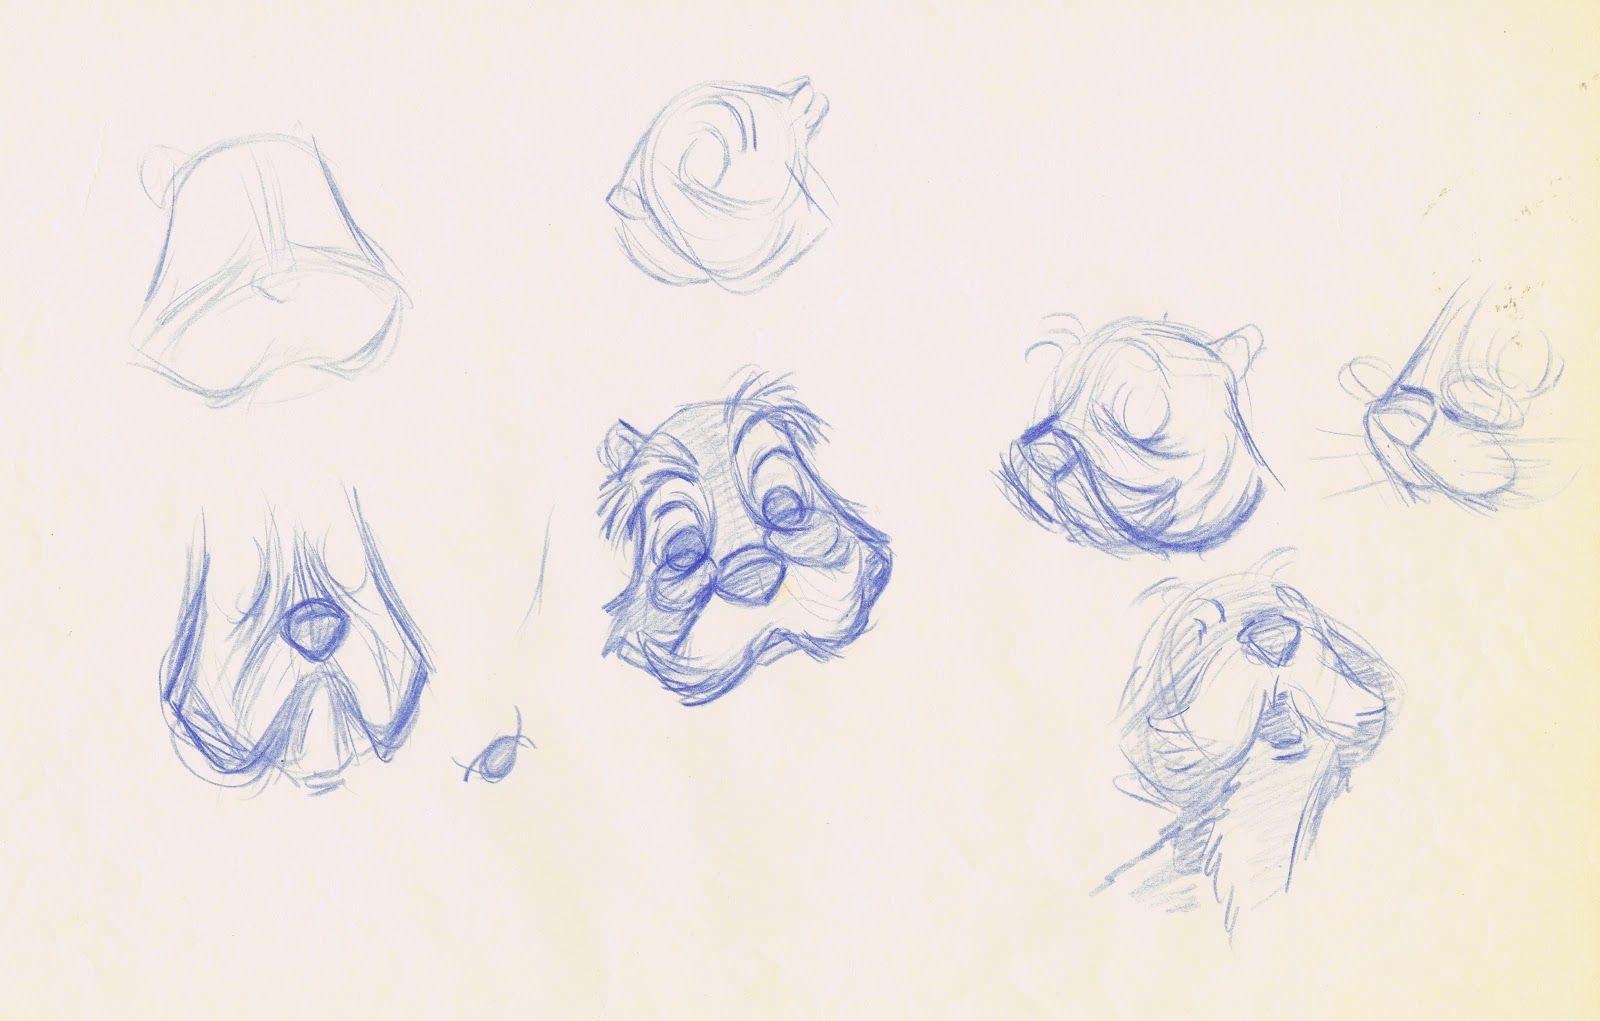 Merlin-squirrel character design roughs from Disney's Sword in the Stone, by Frank Thomas (via Andreas Deja, http://andreasdeja.blogspot.com/2013/01)/s1600/LSB+2.jpeg